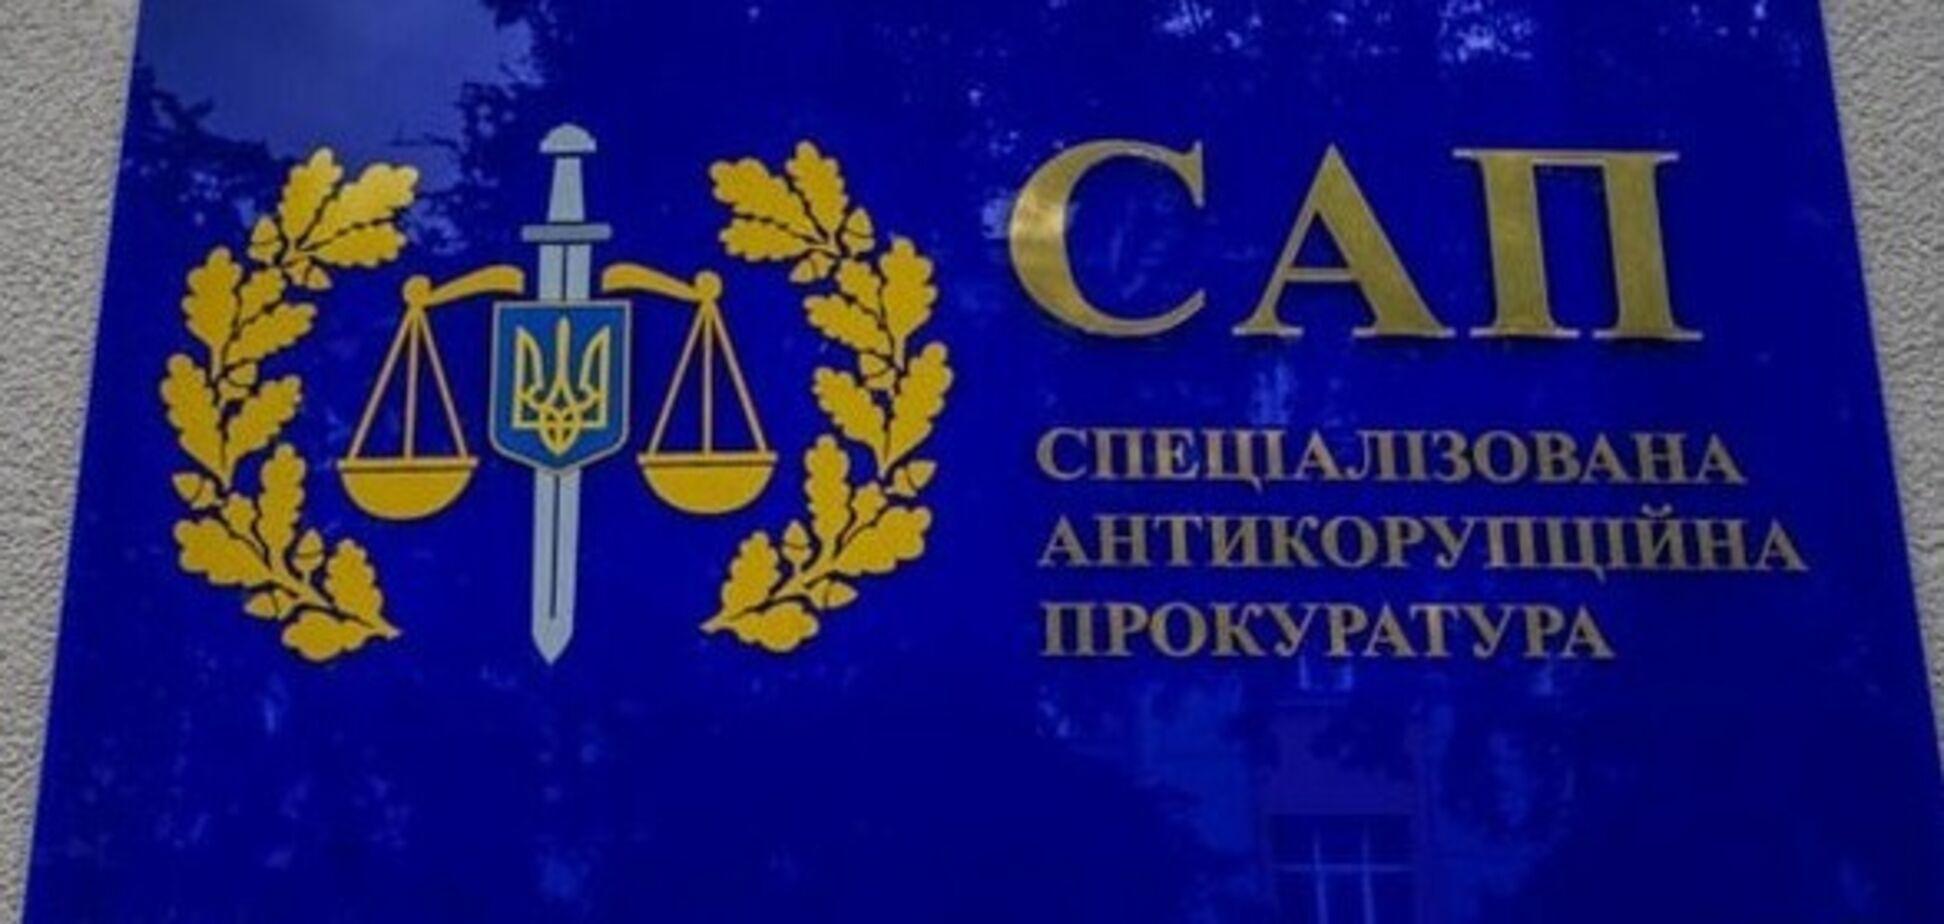 Грищук нарушил закон по делу 'Роттердам +', – Наливайченко